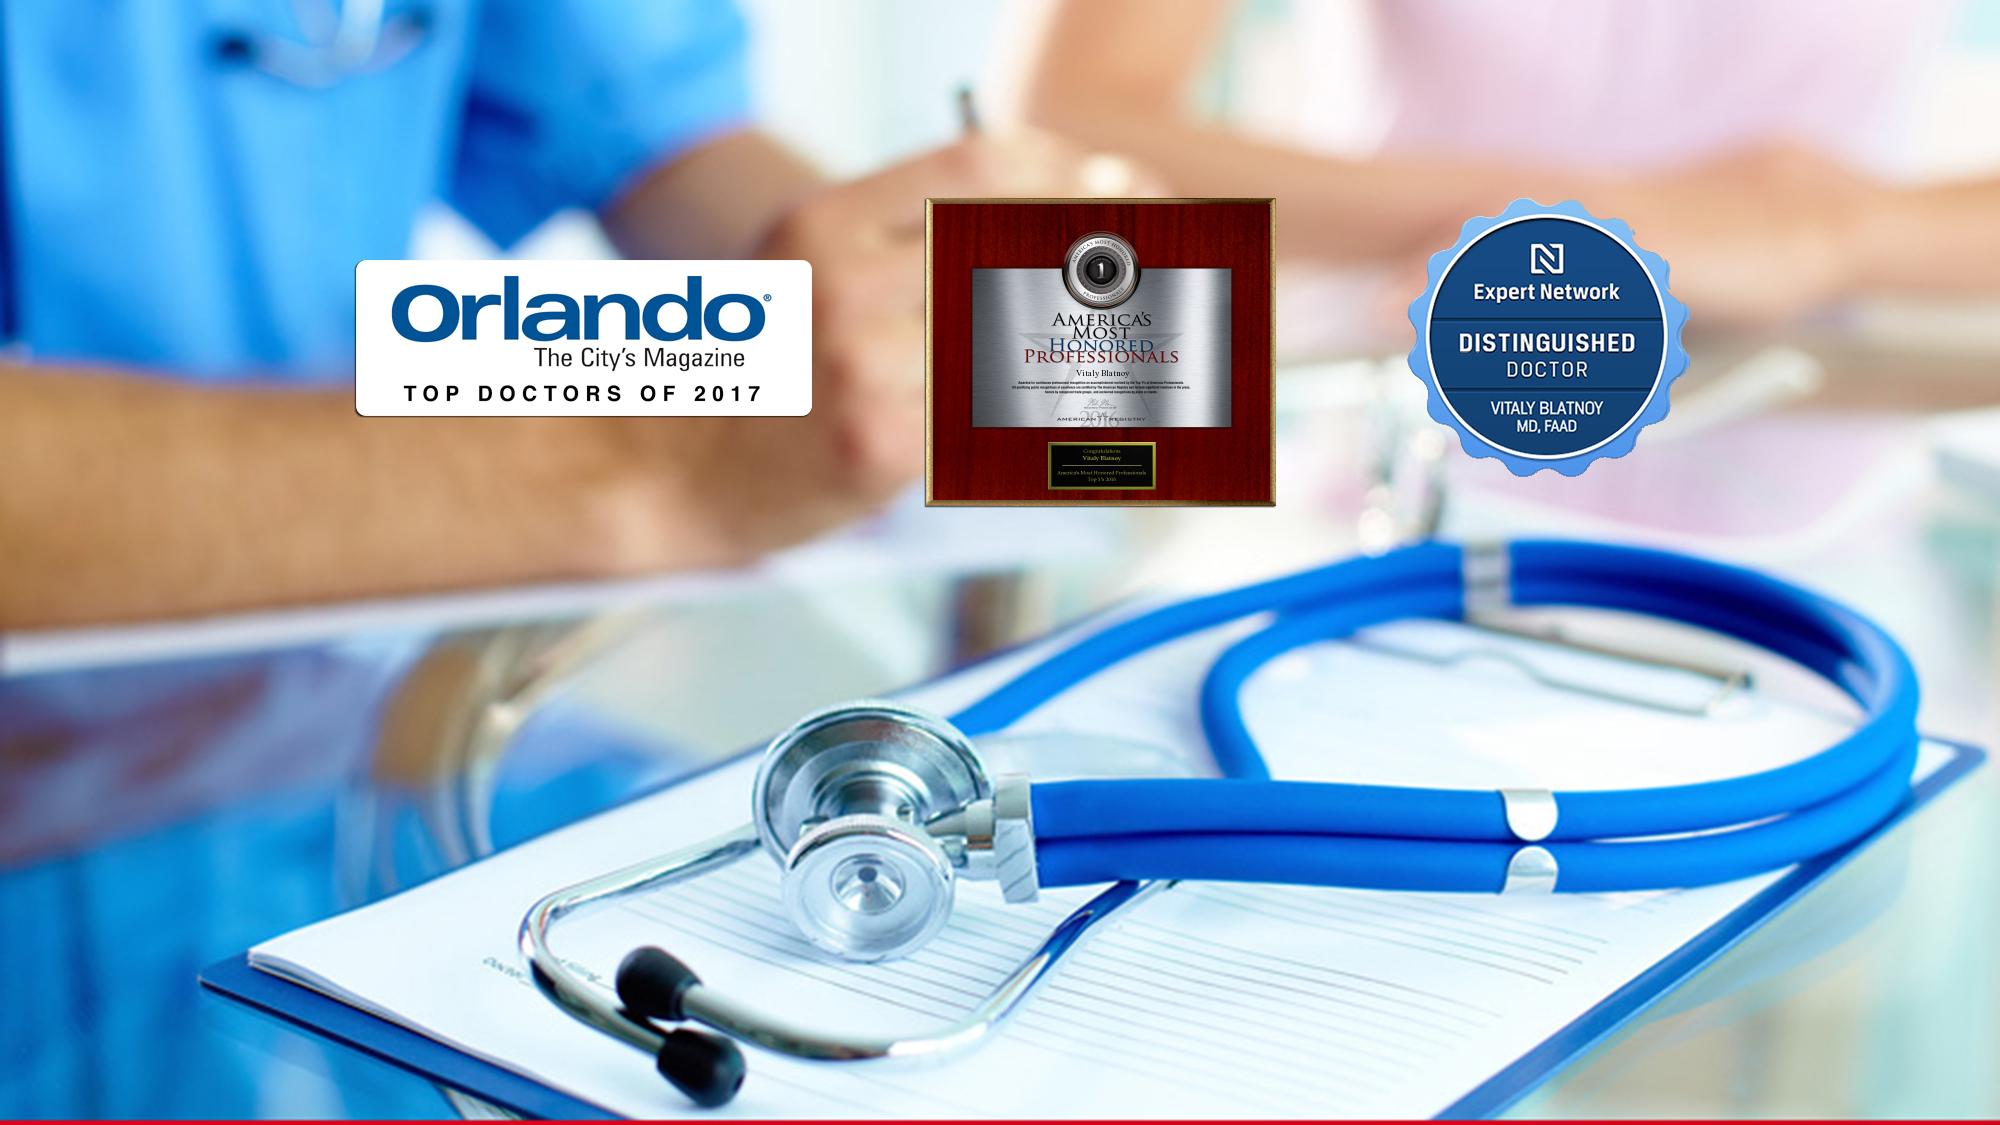 Orlando Dermatology Center Cosmetic Mohs Medical Laser